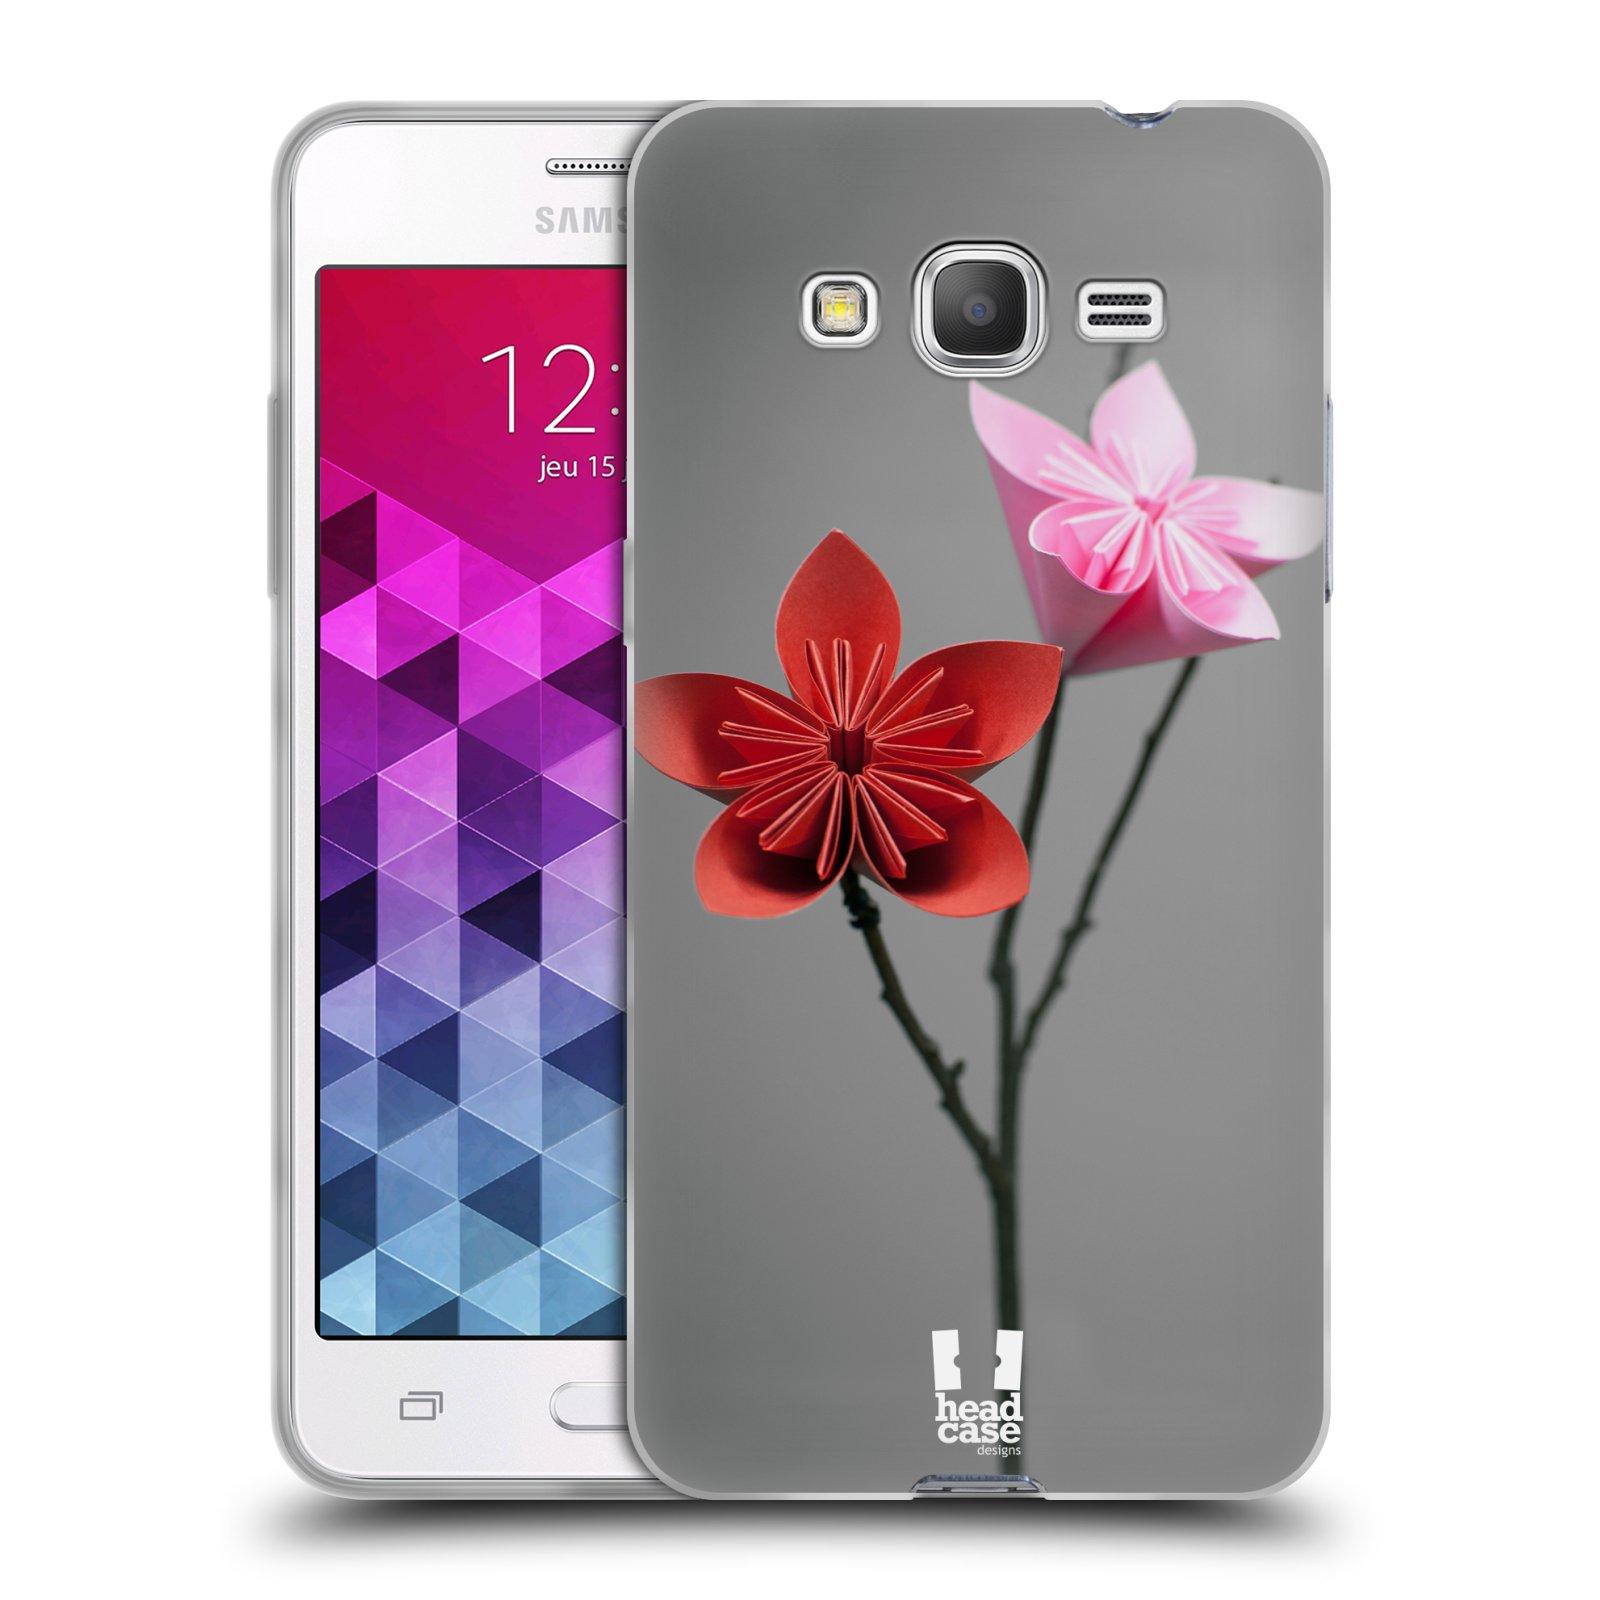 Silikonové pouzdro na mobil Samsung Galaxy Grand Prime VE HEAD CASE KUSUDAMA (Silikonový kryt či obal na mobilní telefon Samsung Galaxy Grand Prime VE SM-G531F)